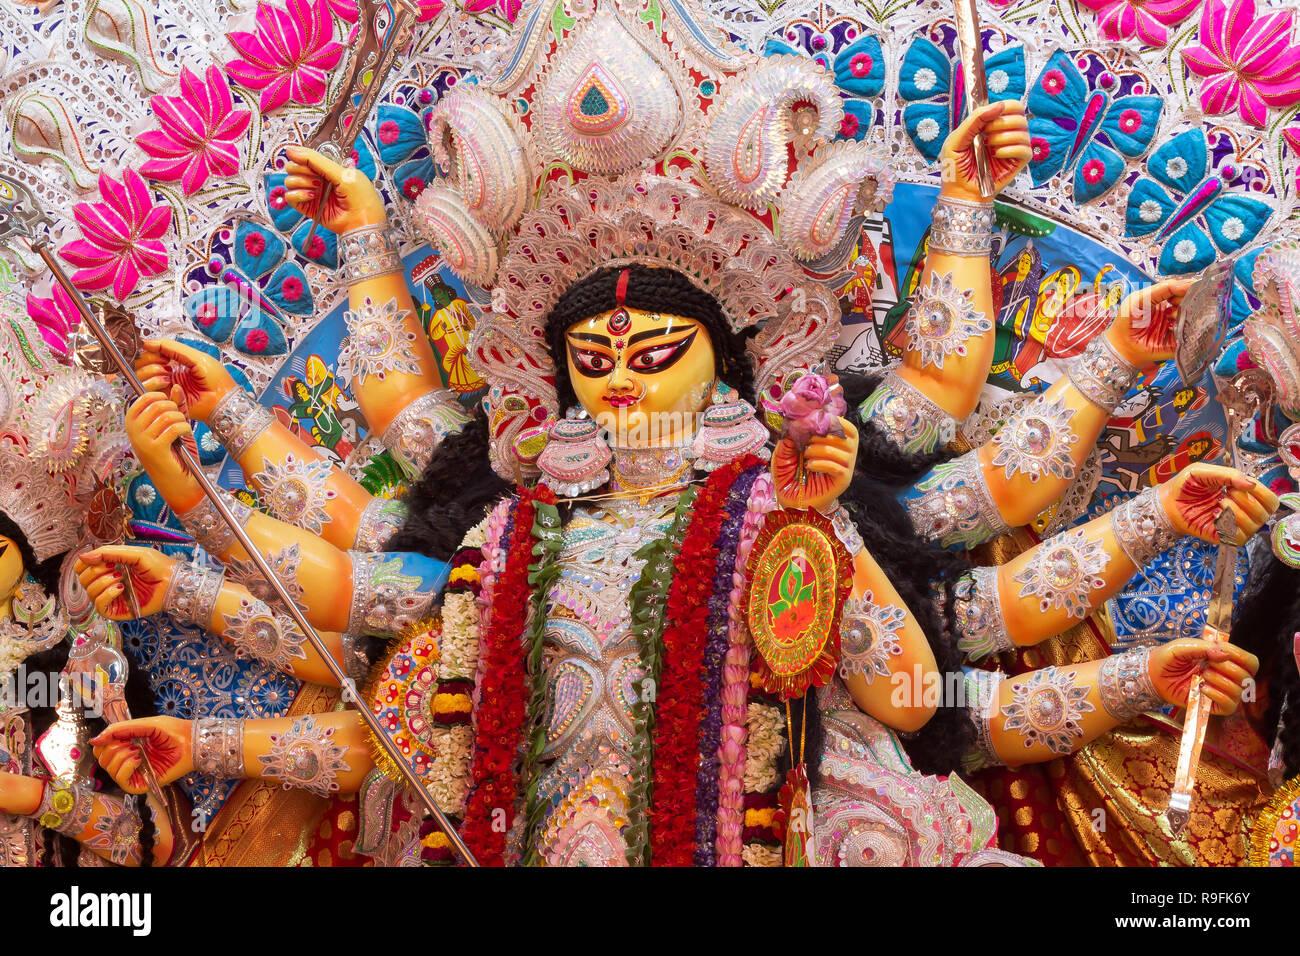 Kali Puja Stock Photos & Kali Puja Stock Images - Alamy